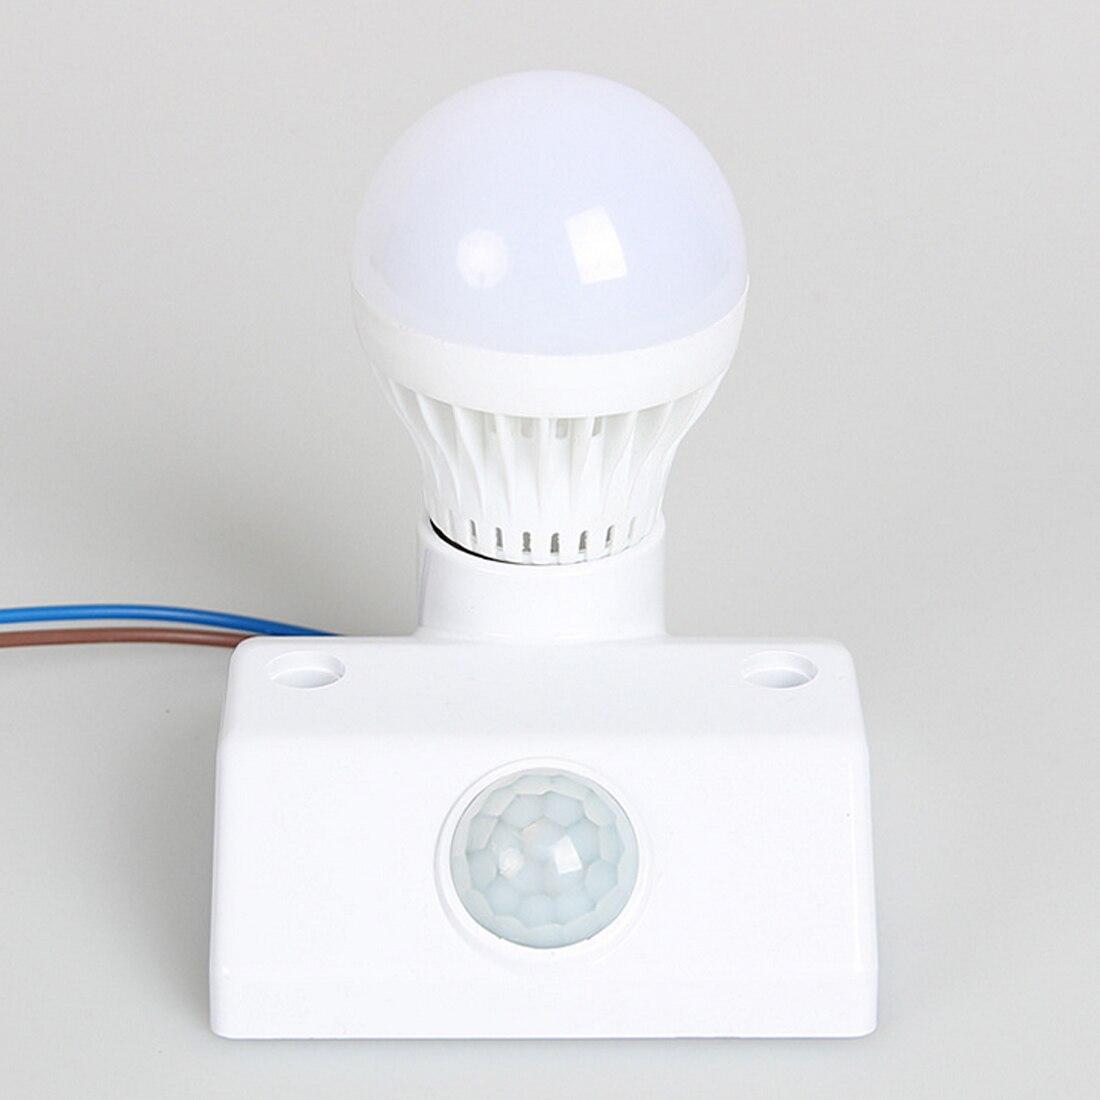 New E27 AC220 50/60HZ Infrared Motion Sensor Automatic Light Lamp Holder Switch Intelligent Light Motion Sensing Switch